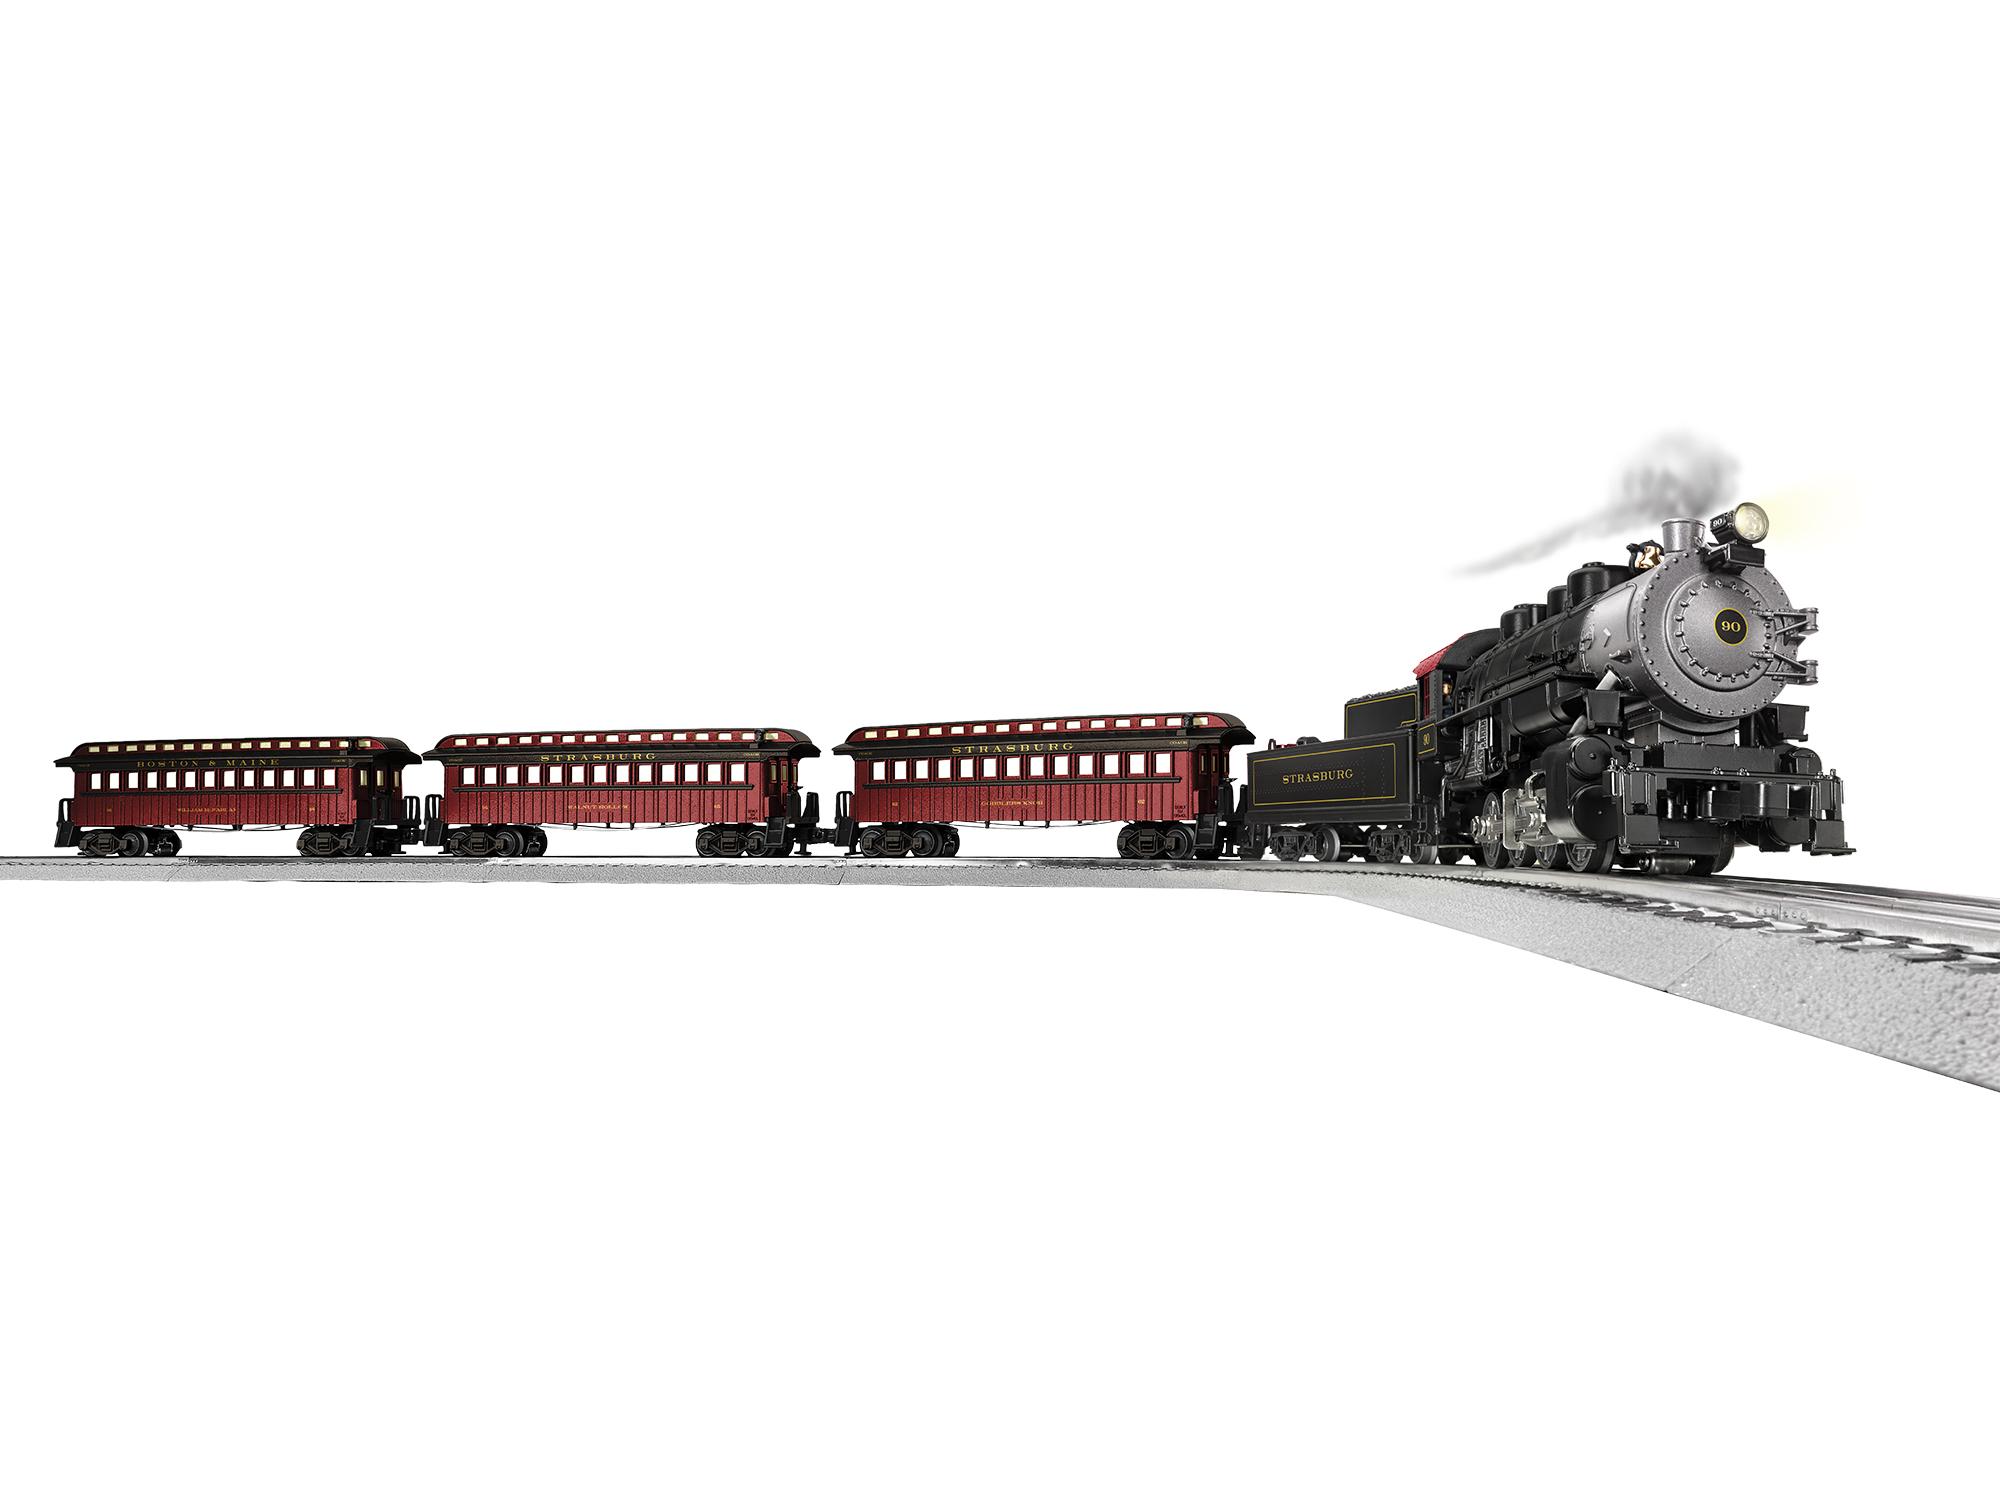 Lionel 2023010 O Strasburg Railroad Set 3-Rail LionChief Sound and Control Strasburg Railroad